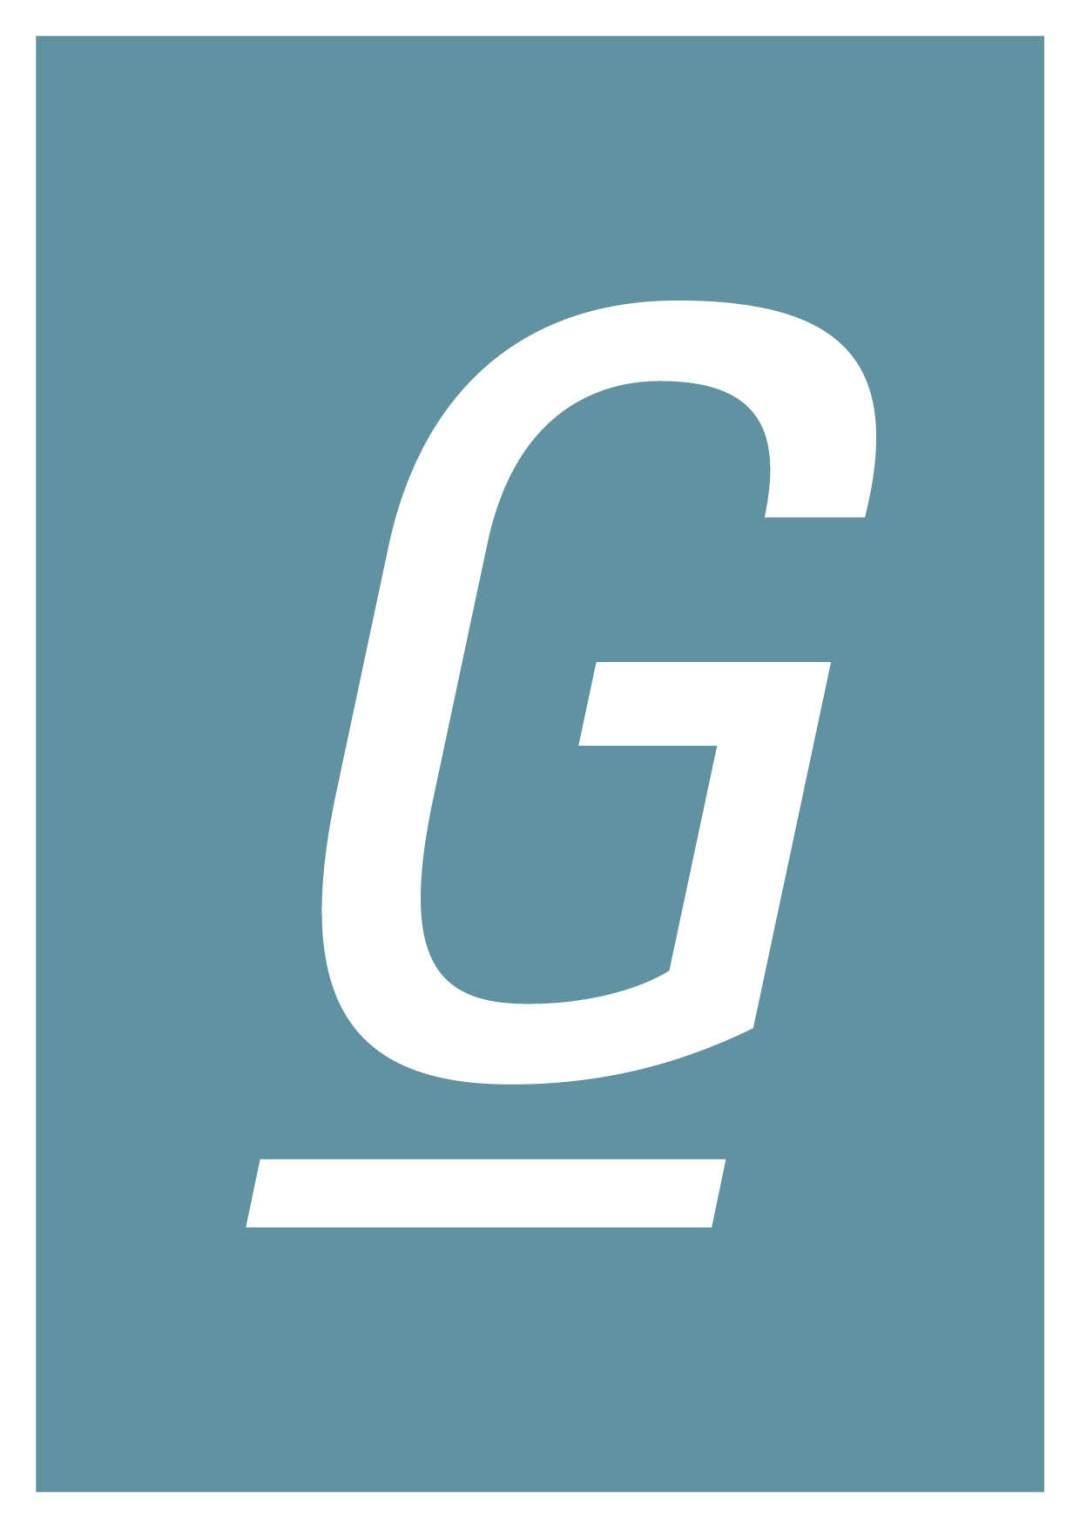 grafisk-profil-garveriet-20183